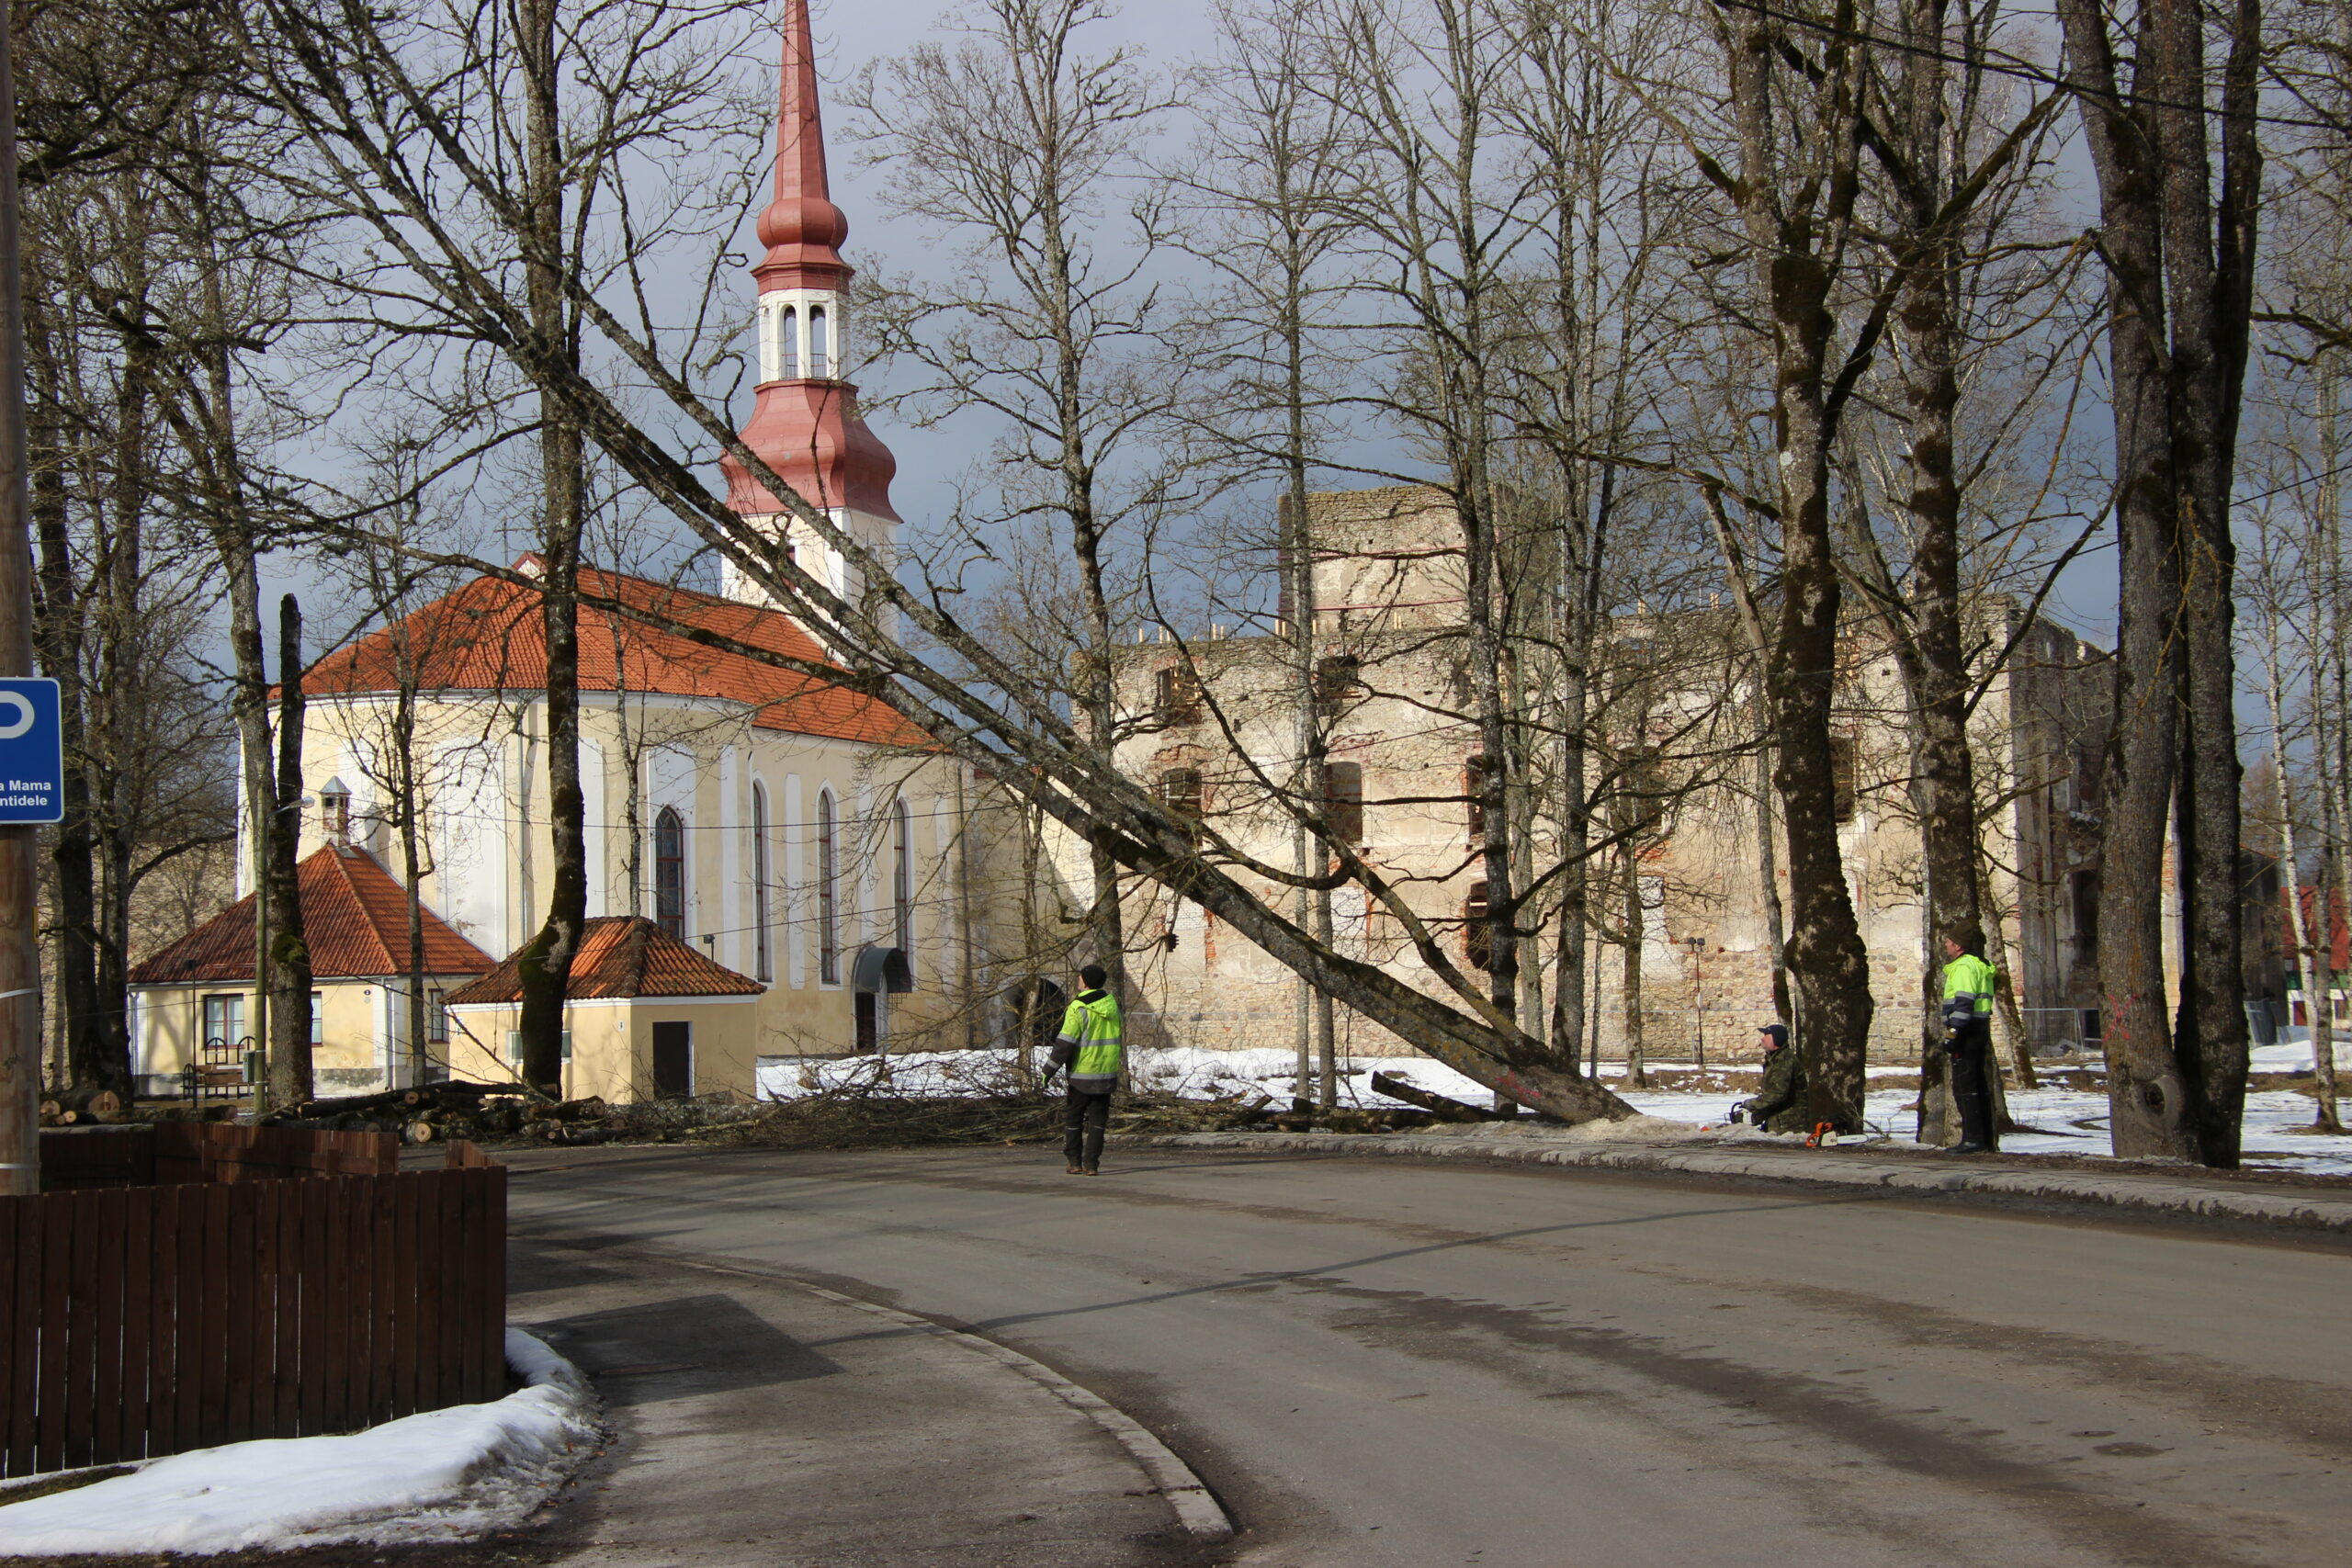 Foto Raimo Metsamärt.